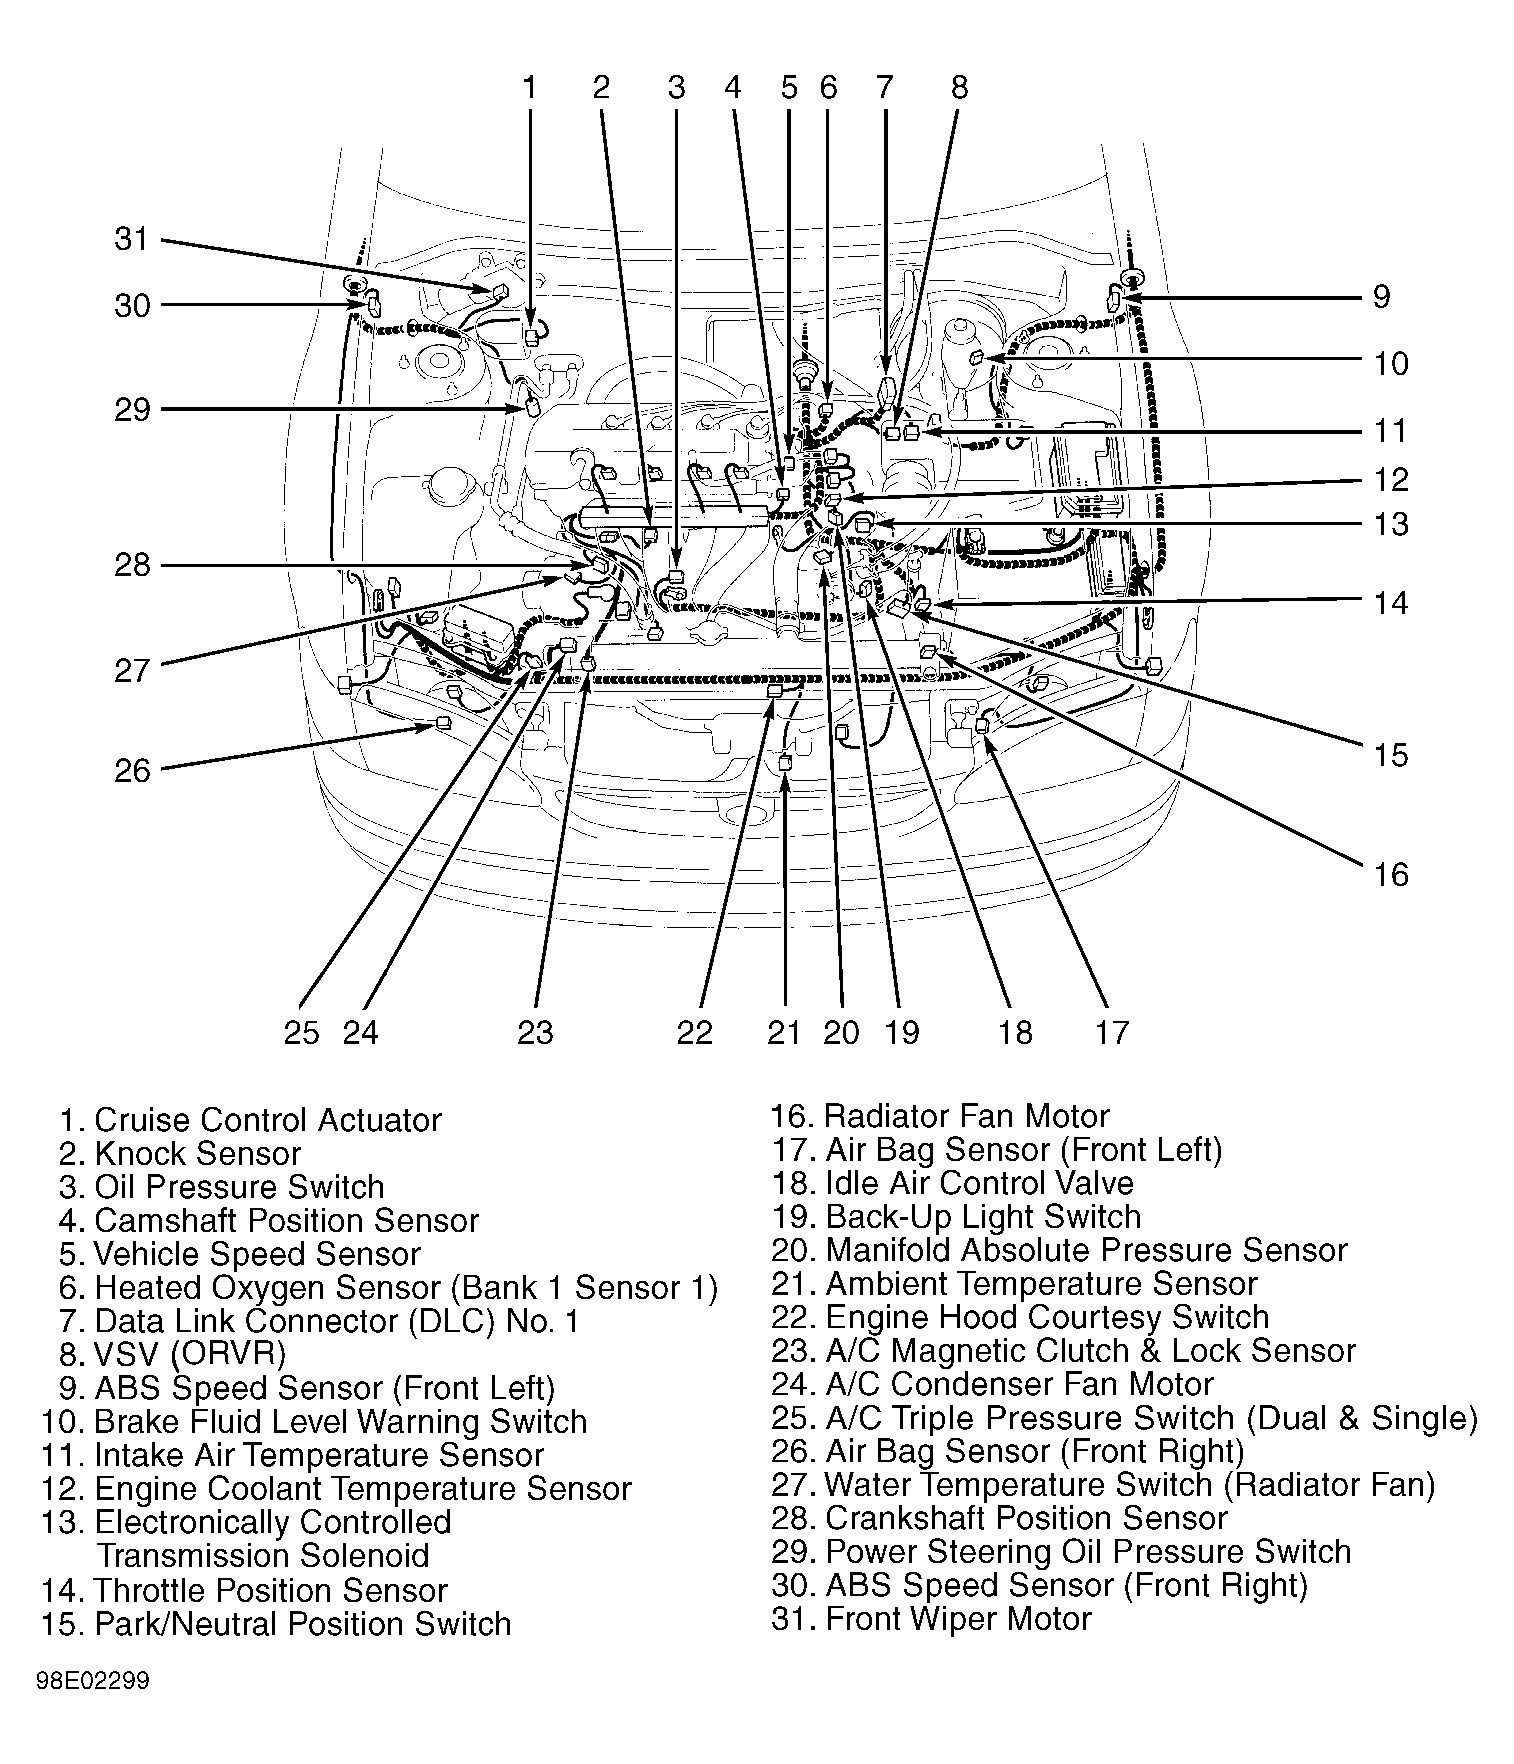 2004 toyota corolla oem parts diagram wiring schematic  2004 toyota corolla oem parts diagram wiring schematic #7